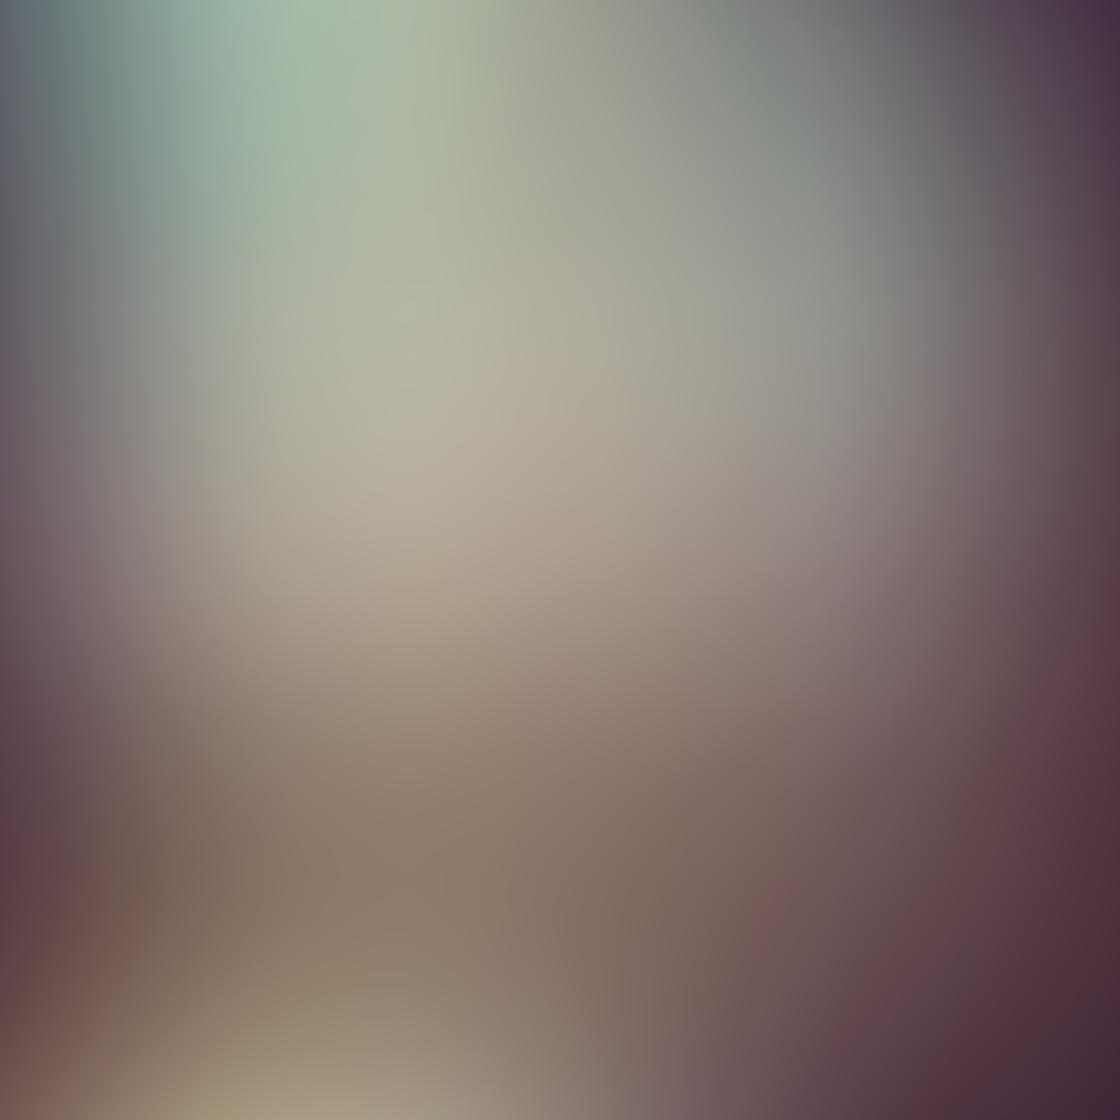 iPhone Weather Photo 05